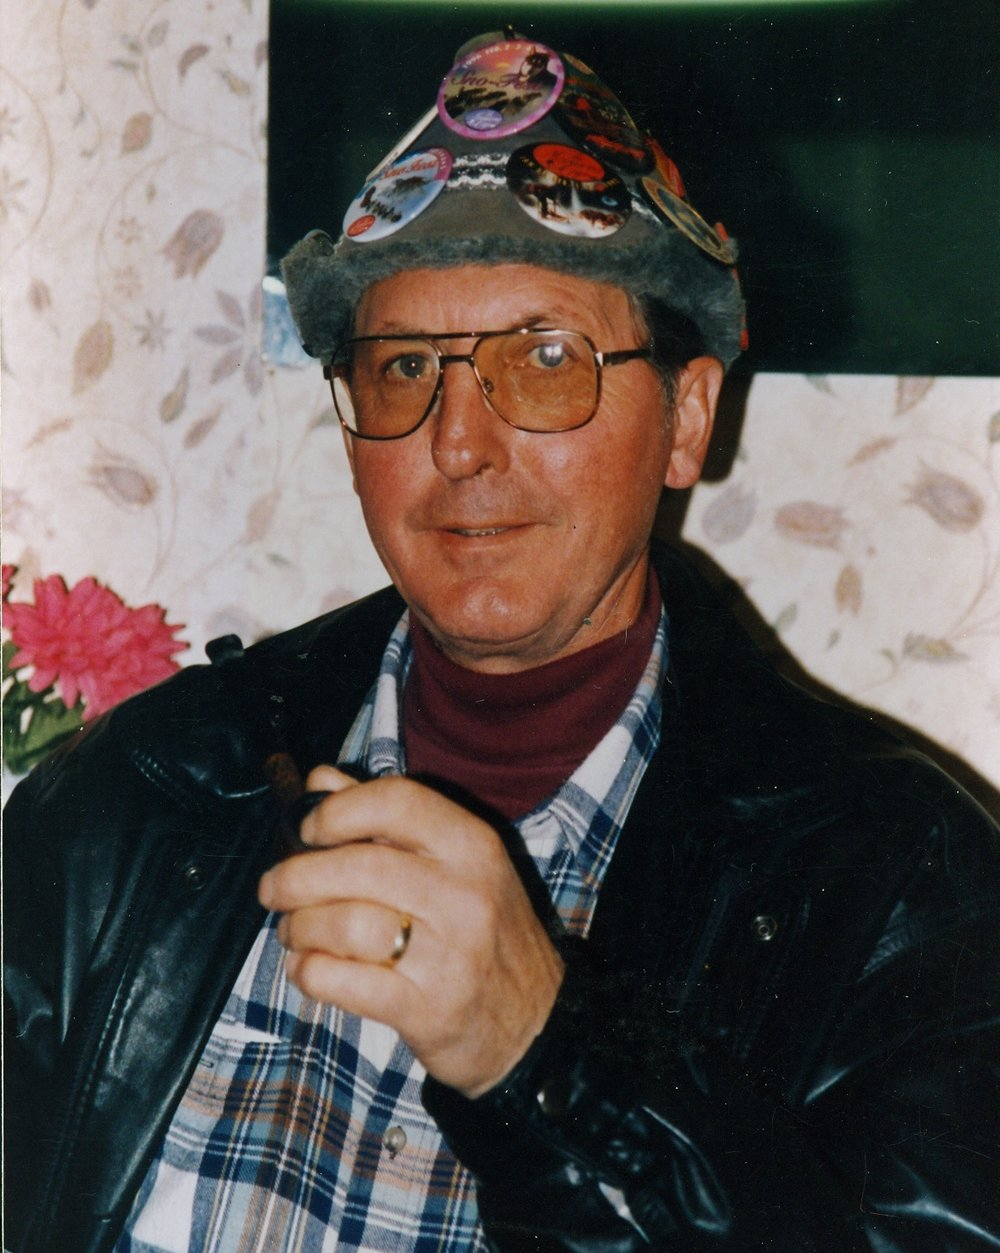 Snofest 1996 Bob Drummond,  Trail Blazer.jpg